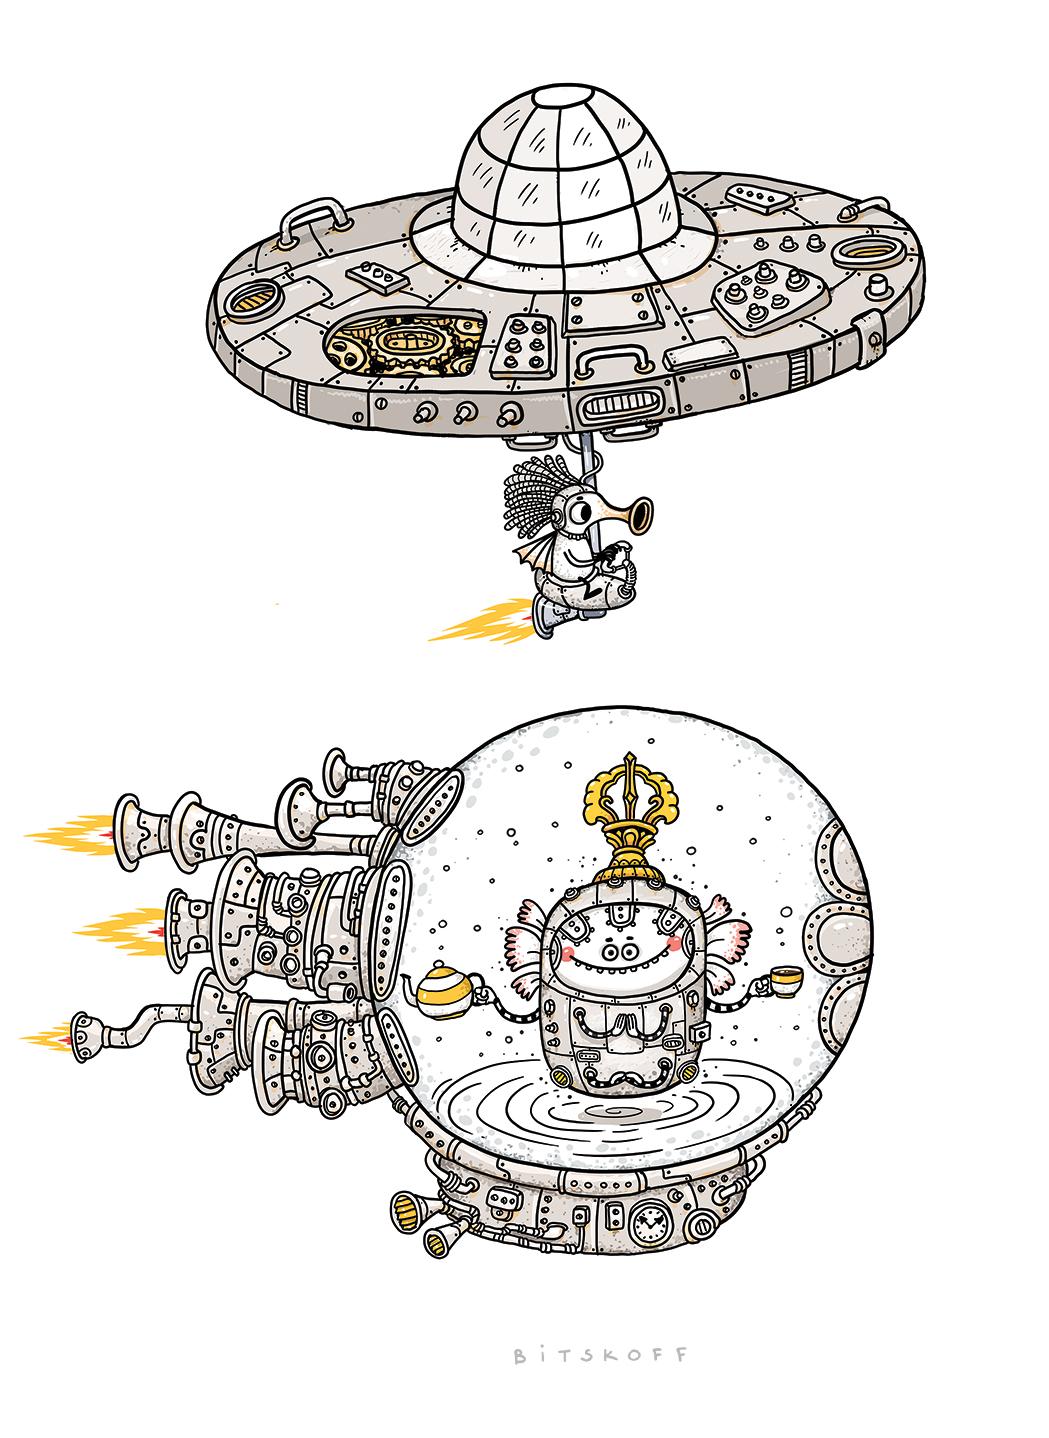 twoships.jpg